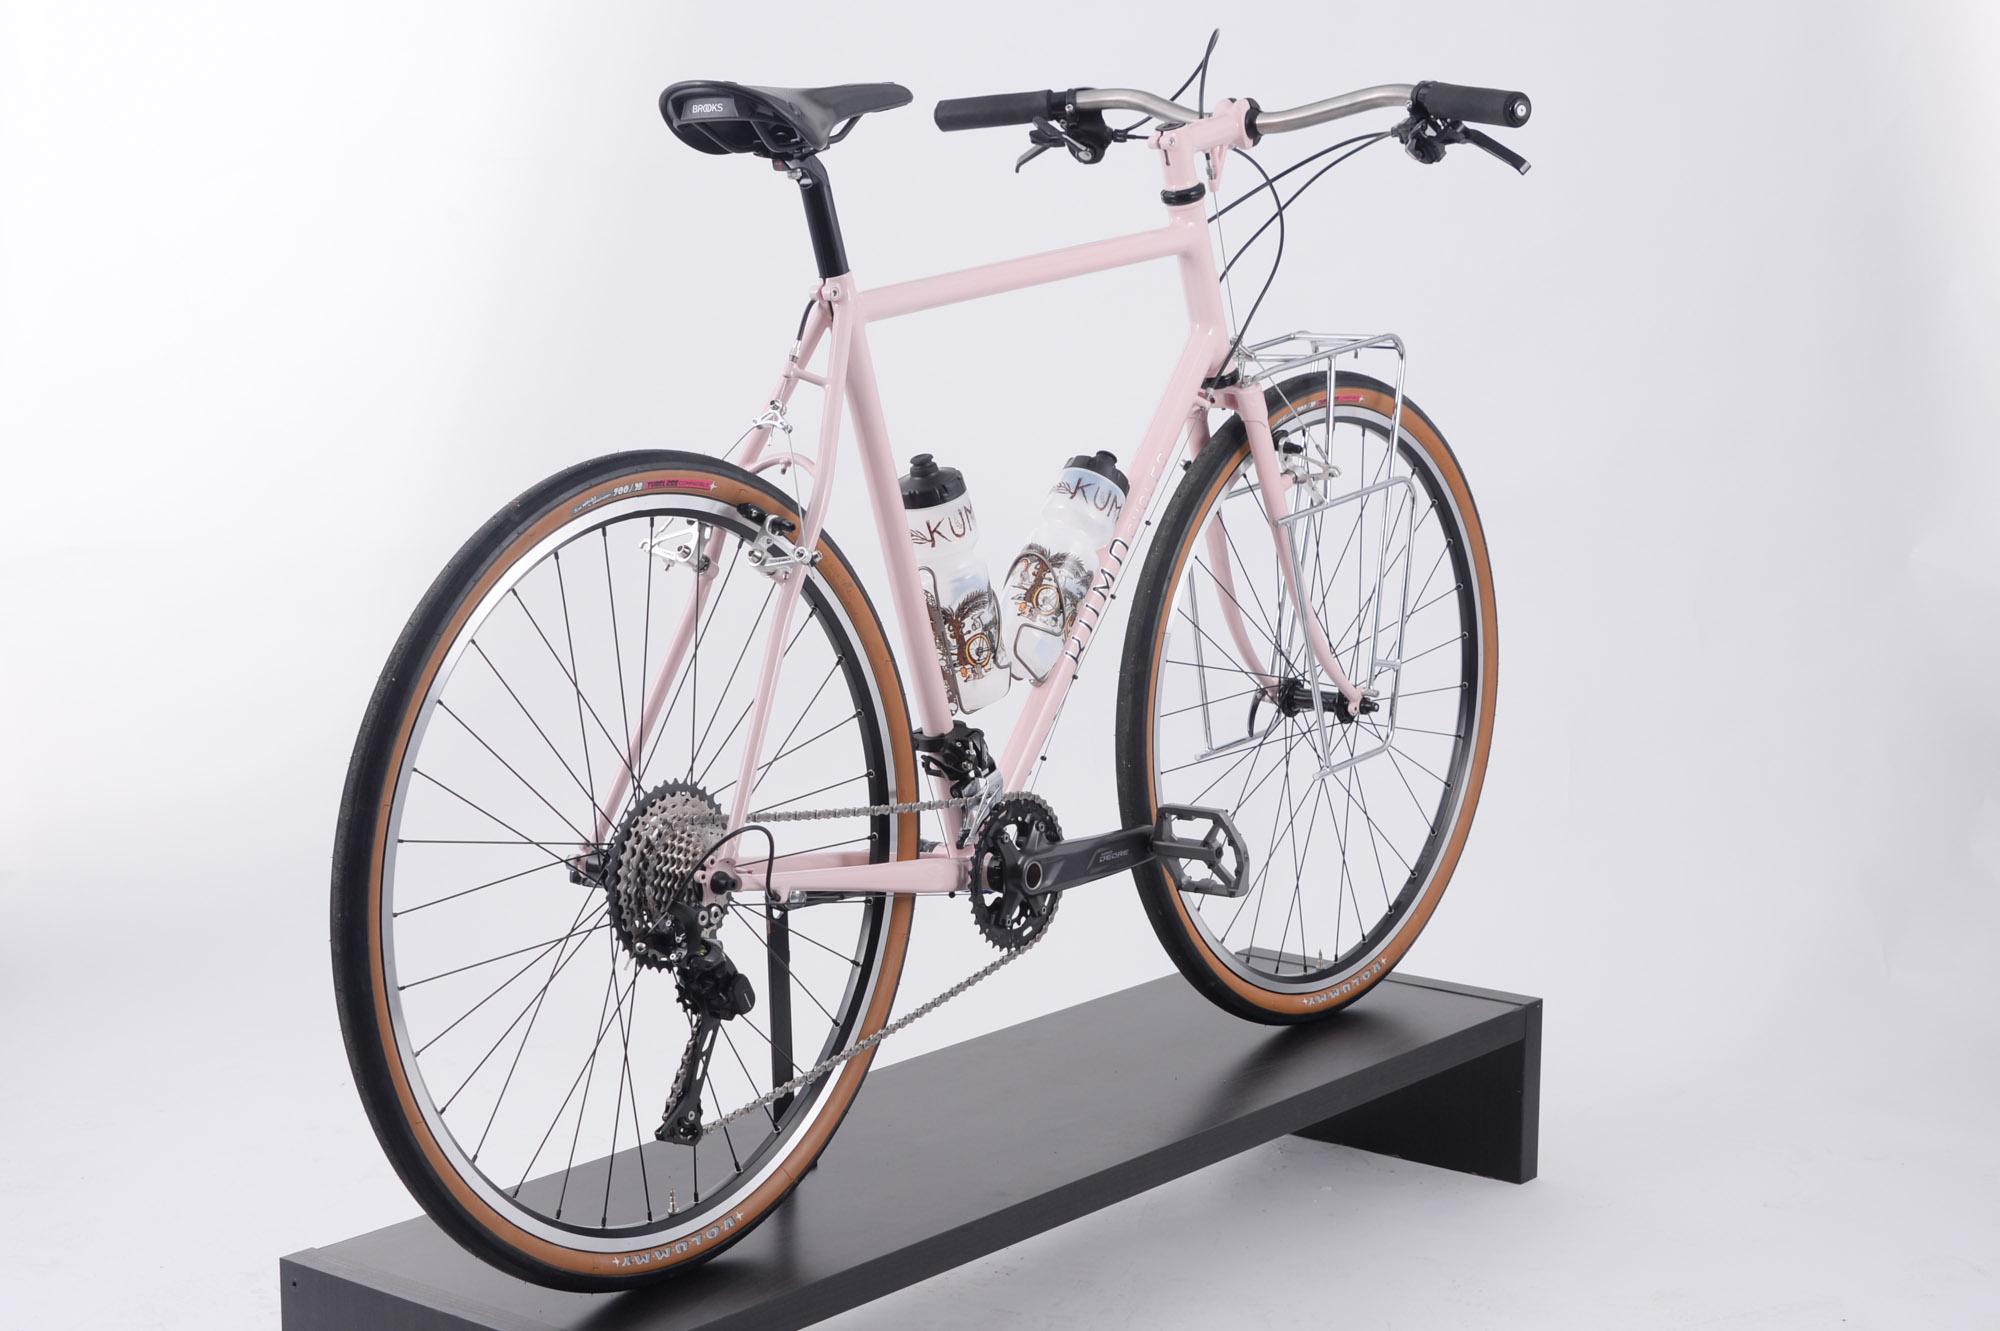 Kumo Cycles